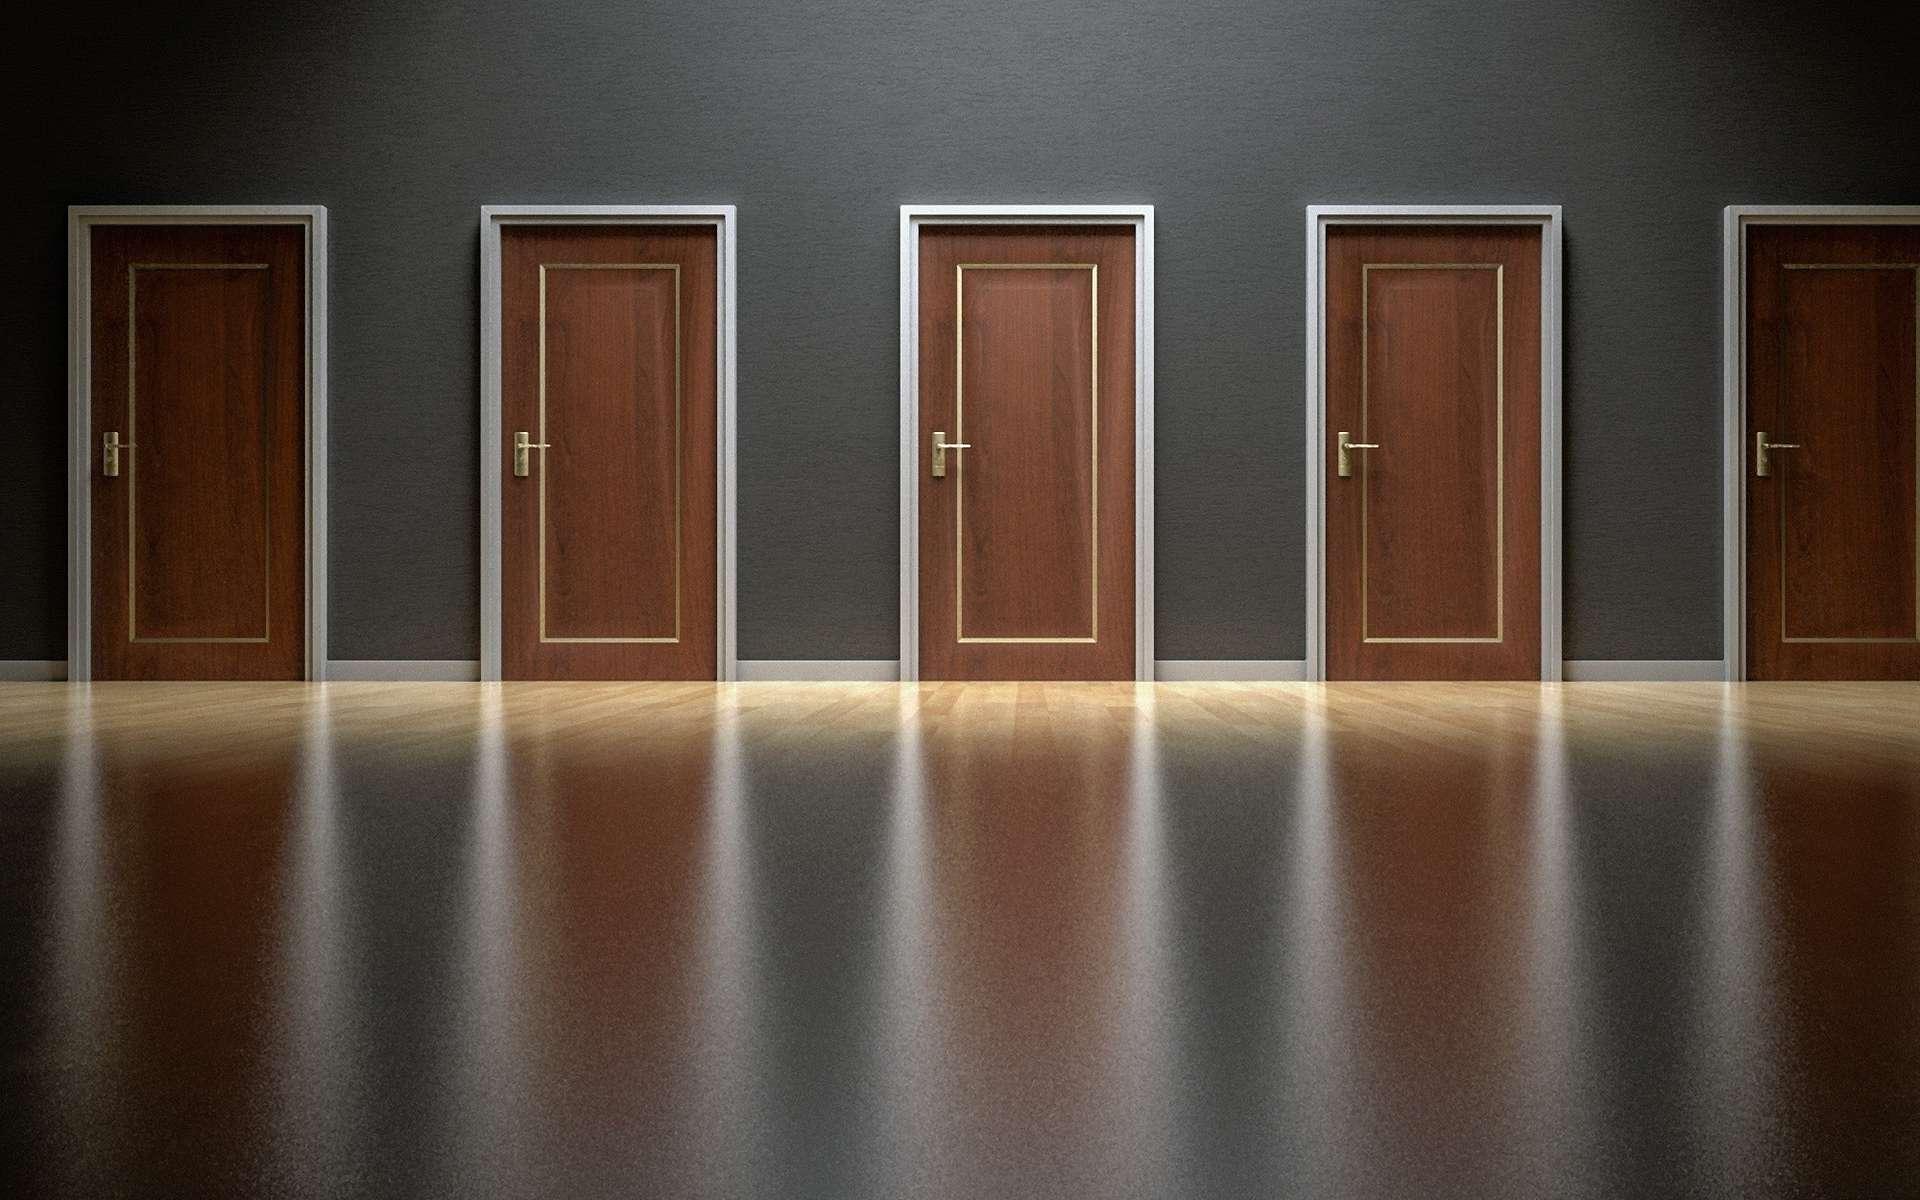 Closed Brown Wooden Doors Inside Poor Lighted Room. © Pixabay